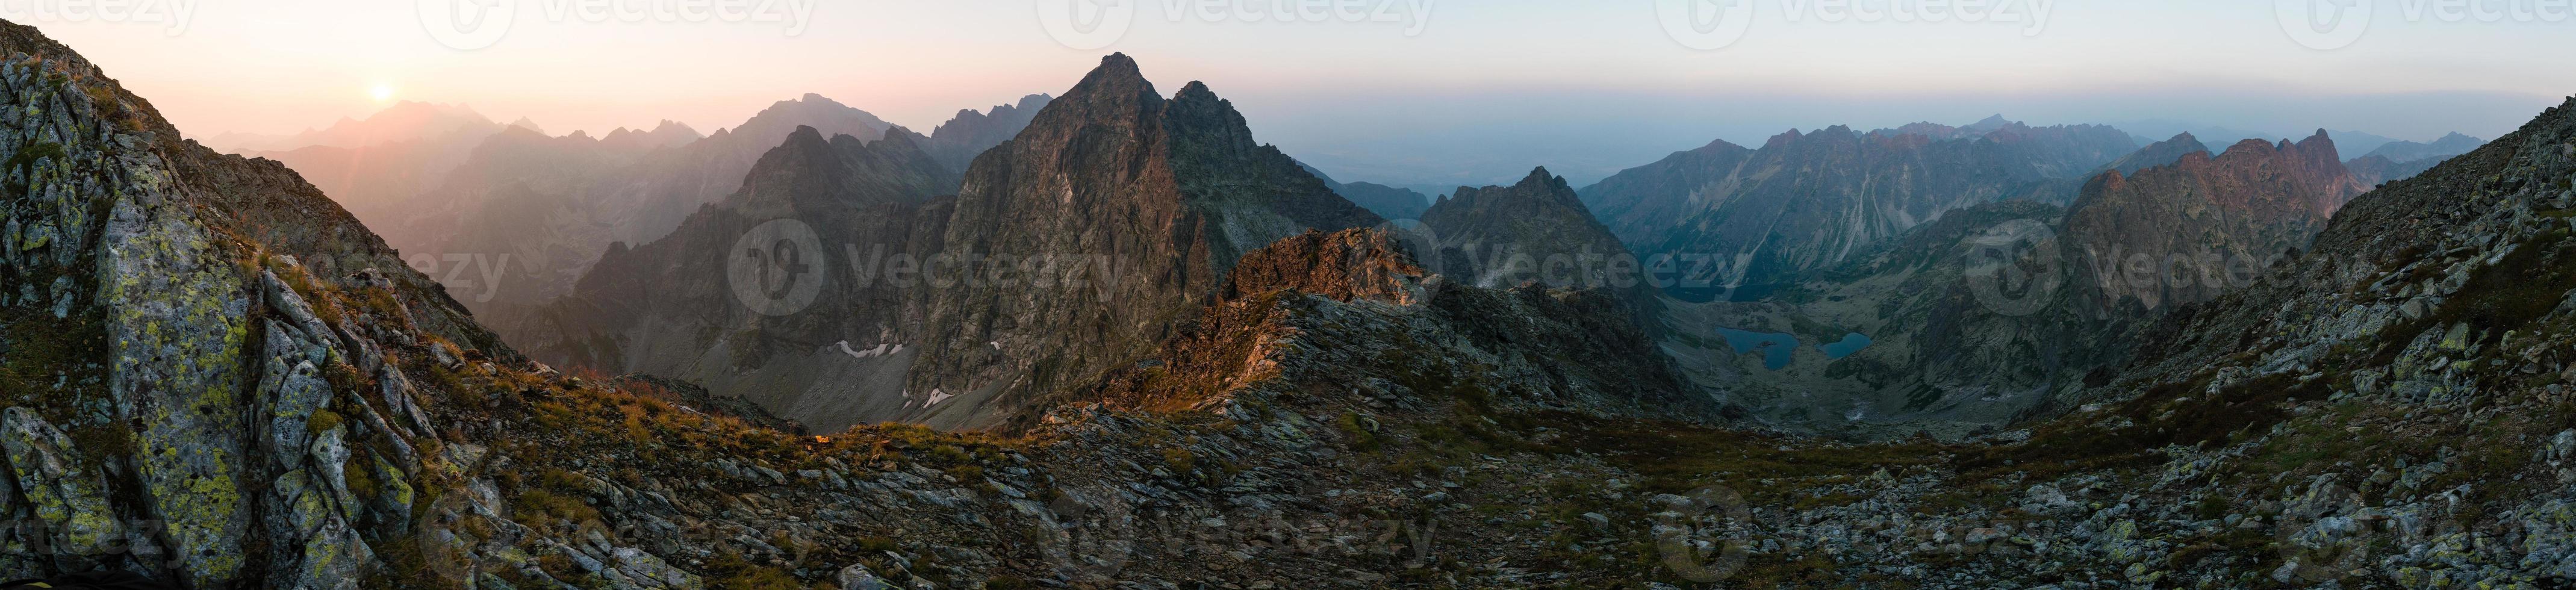 hoge tatra-toppen van rysy-top tijdens zonsopgang foto